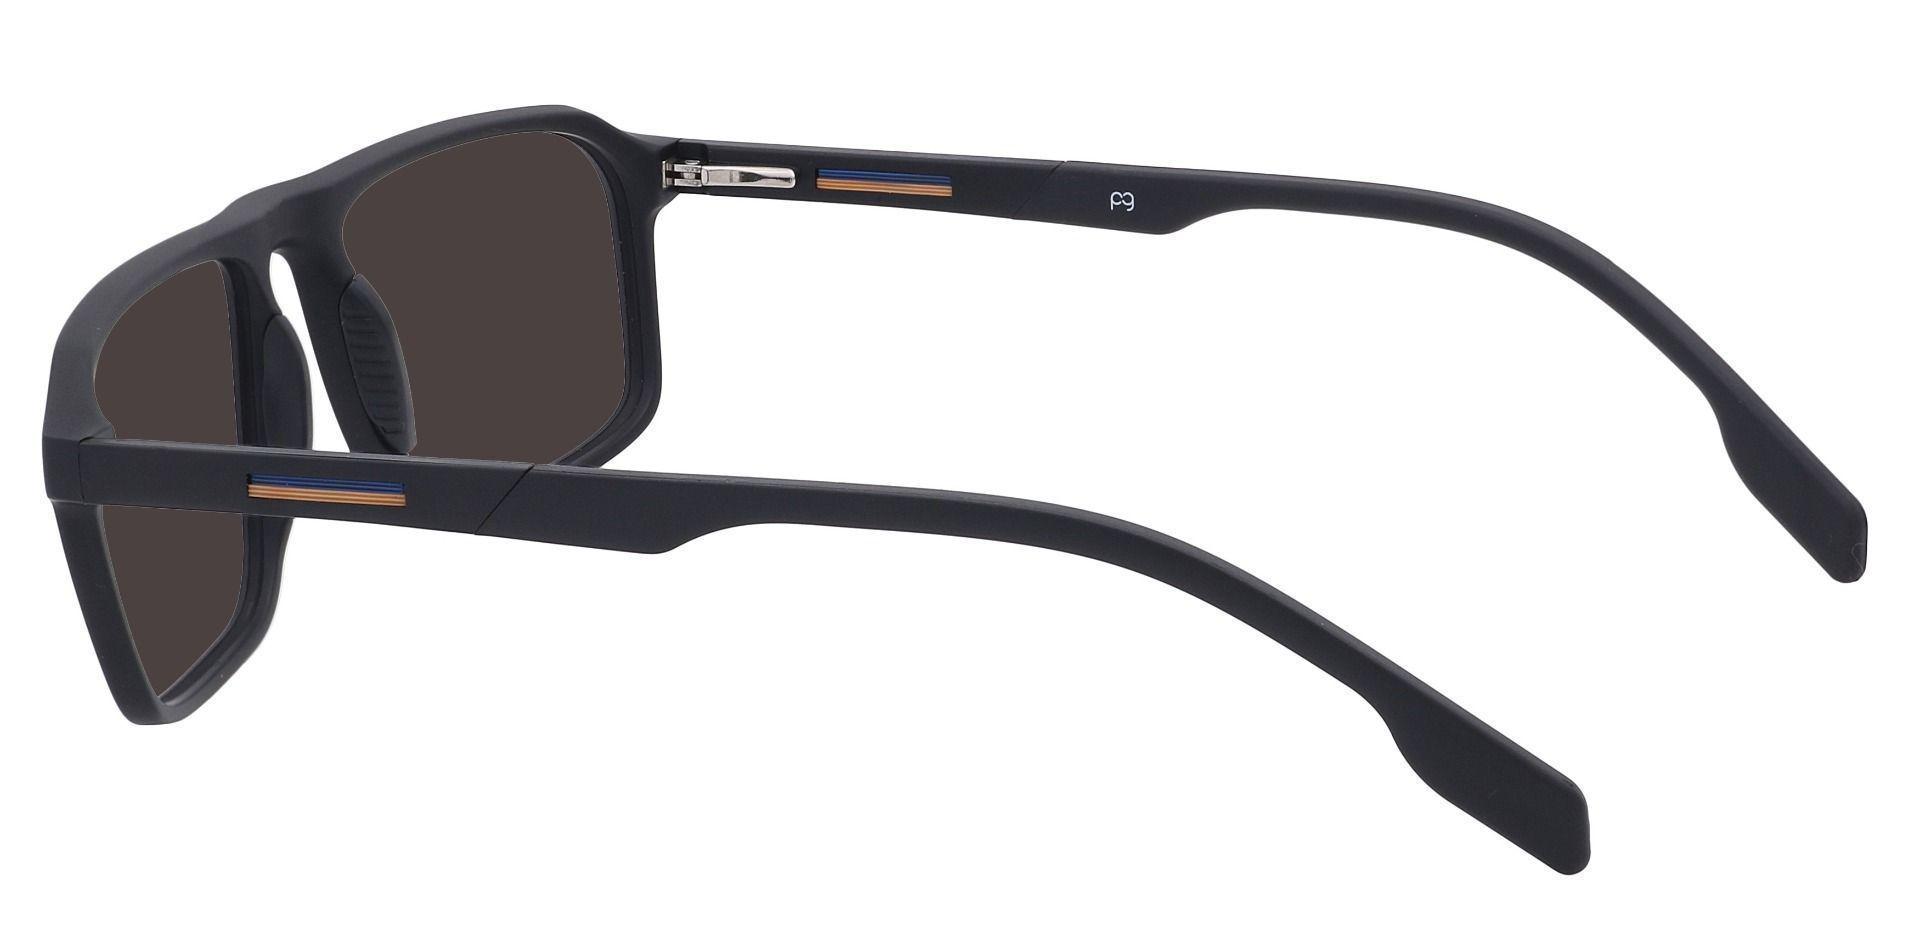 Hector Rectangle Prescription Sunglasses - Black Frame With Gray Lenses